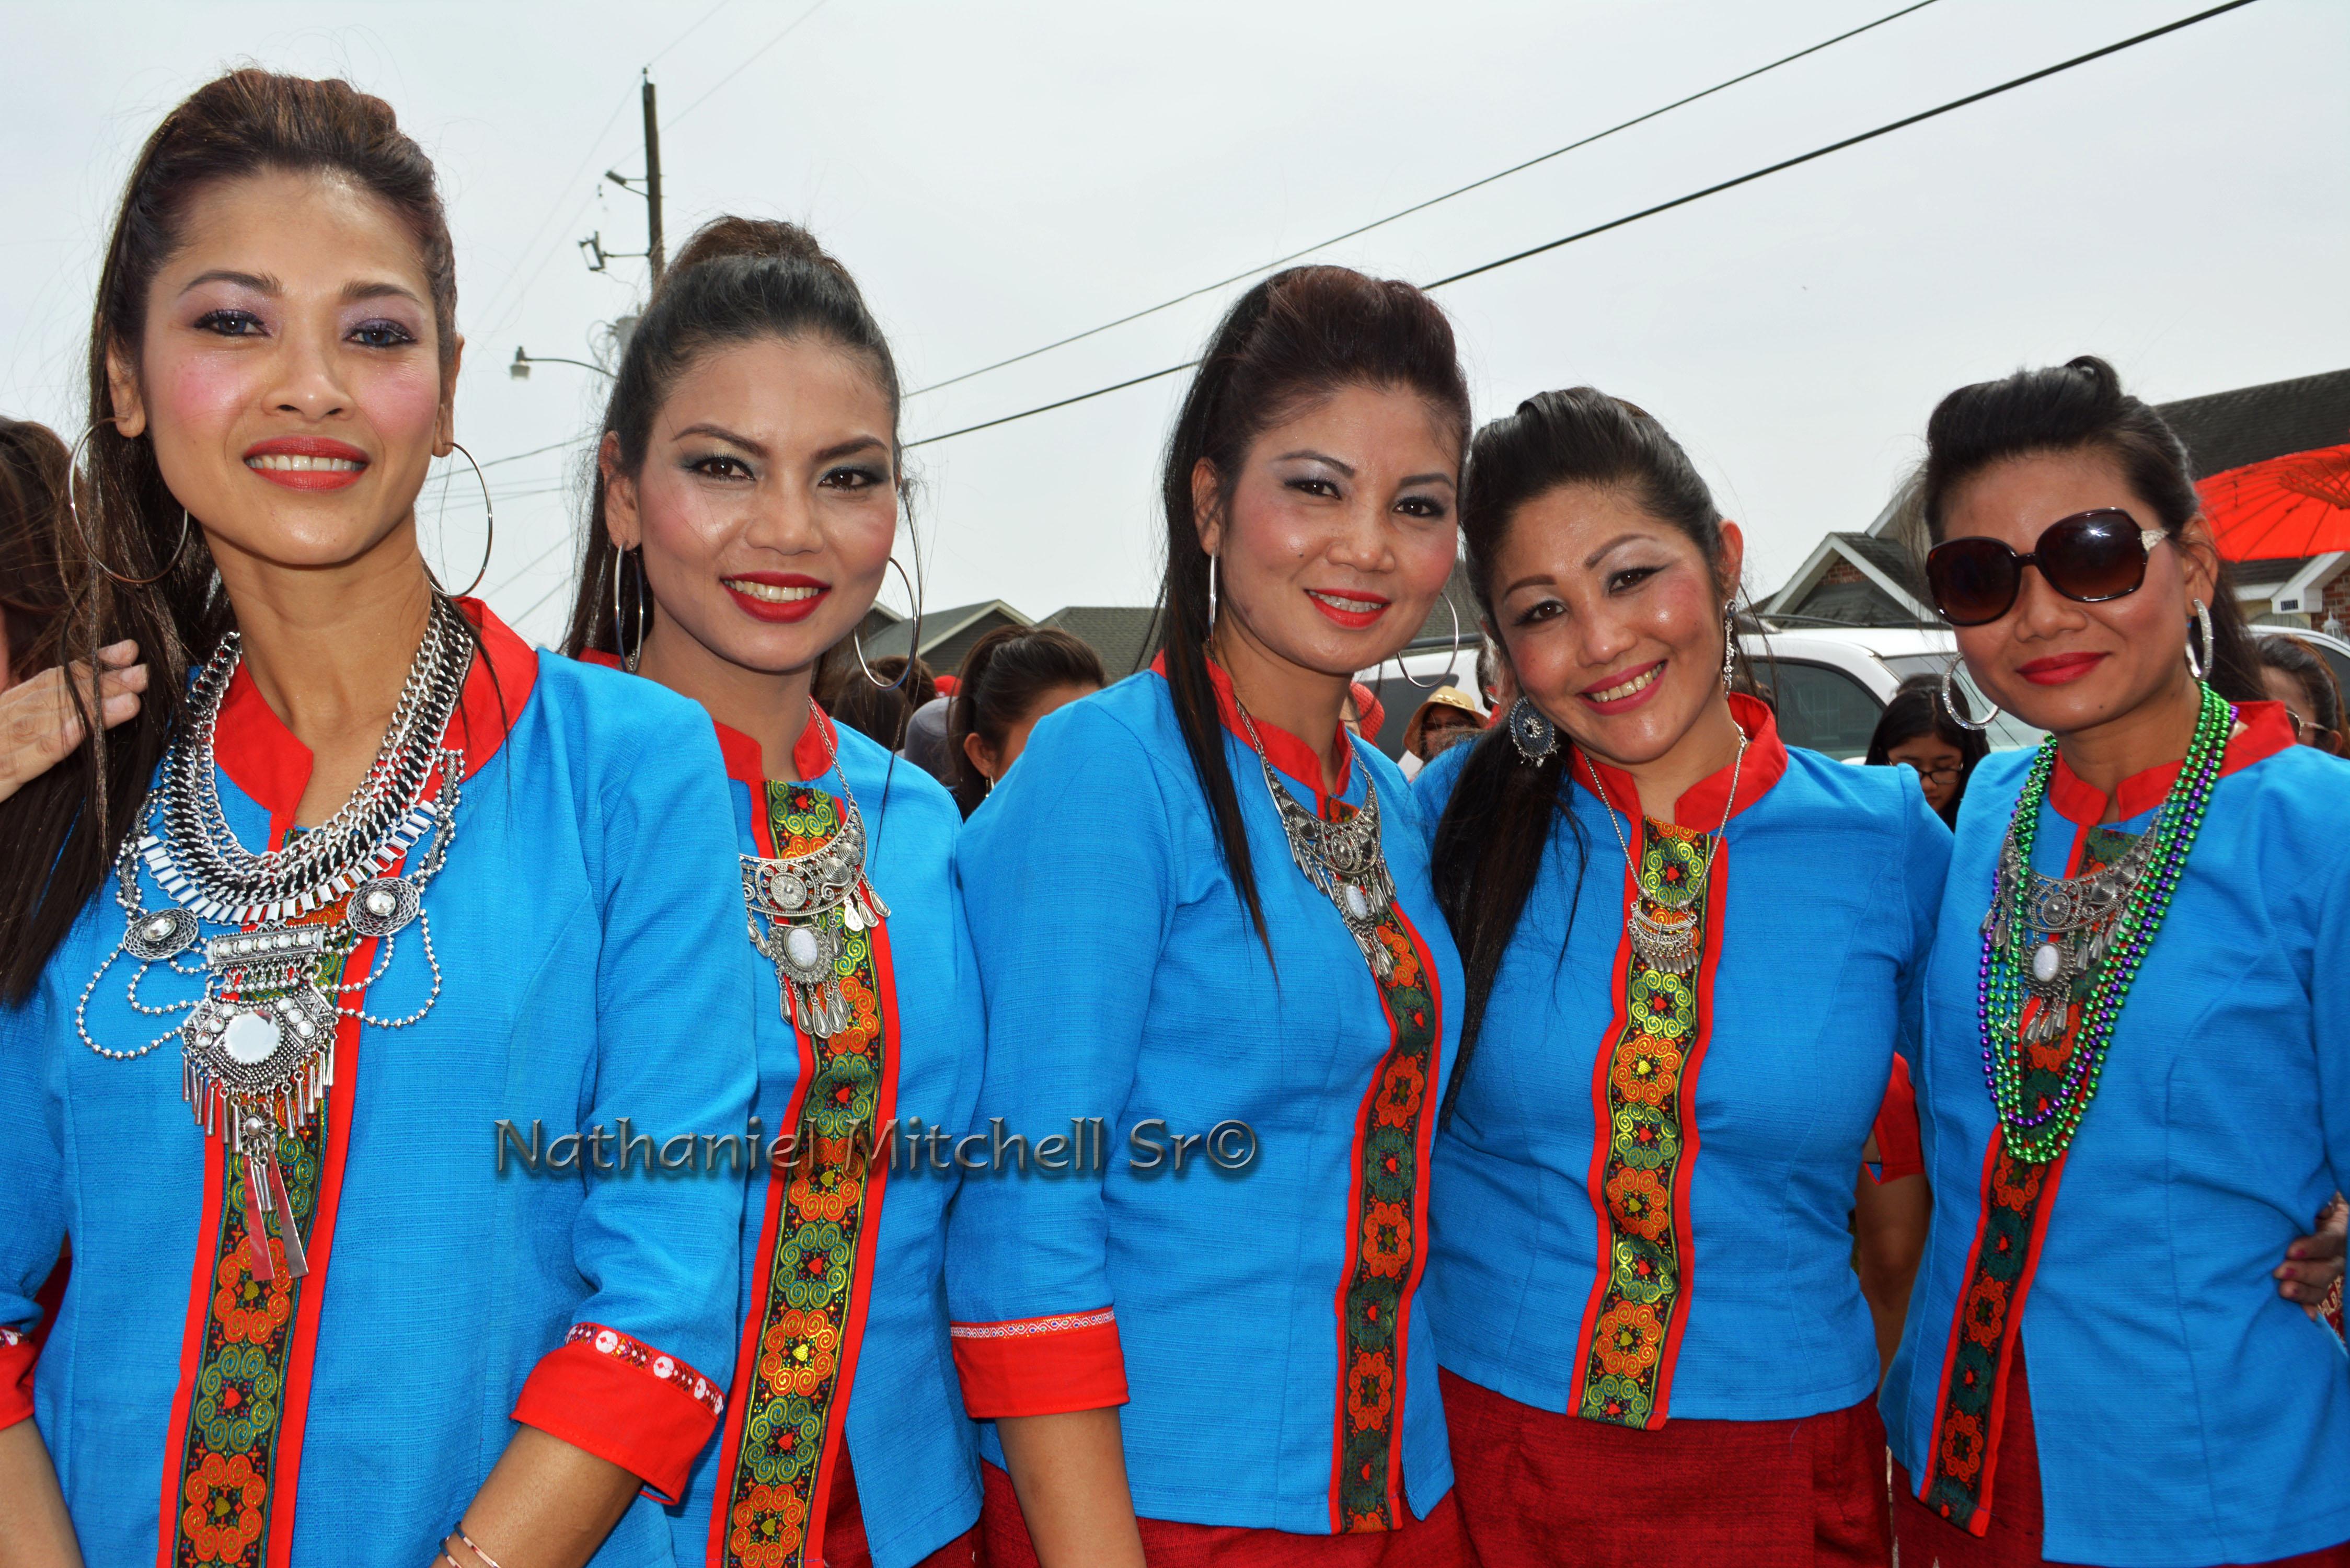 Lao Ladies at Lao New Year Celebration in Coteau, Louisiana